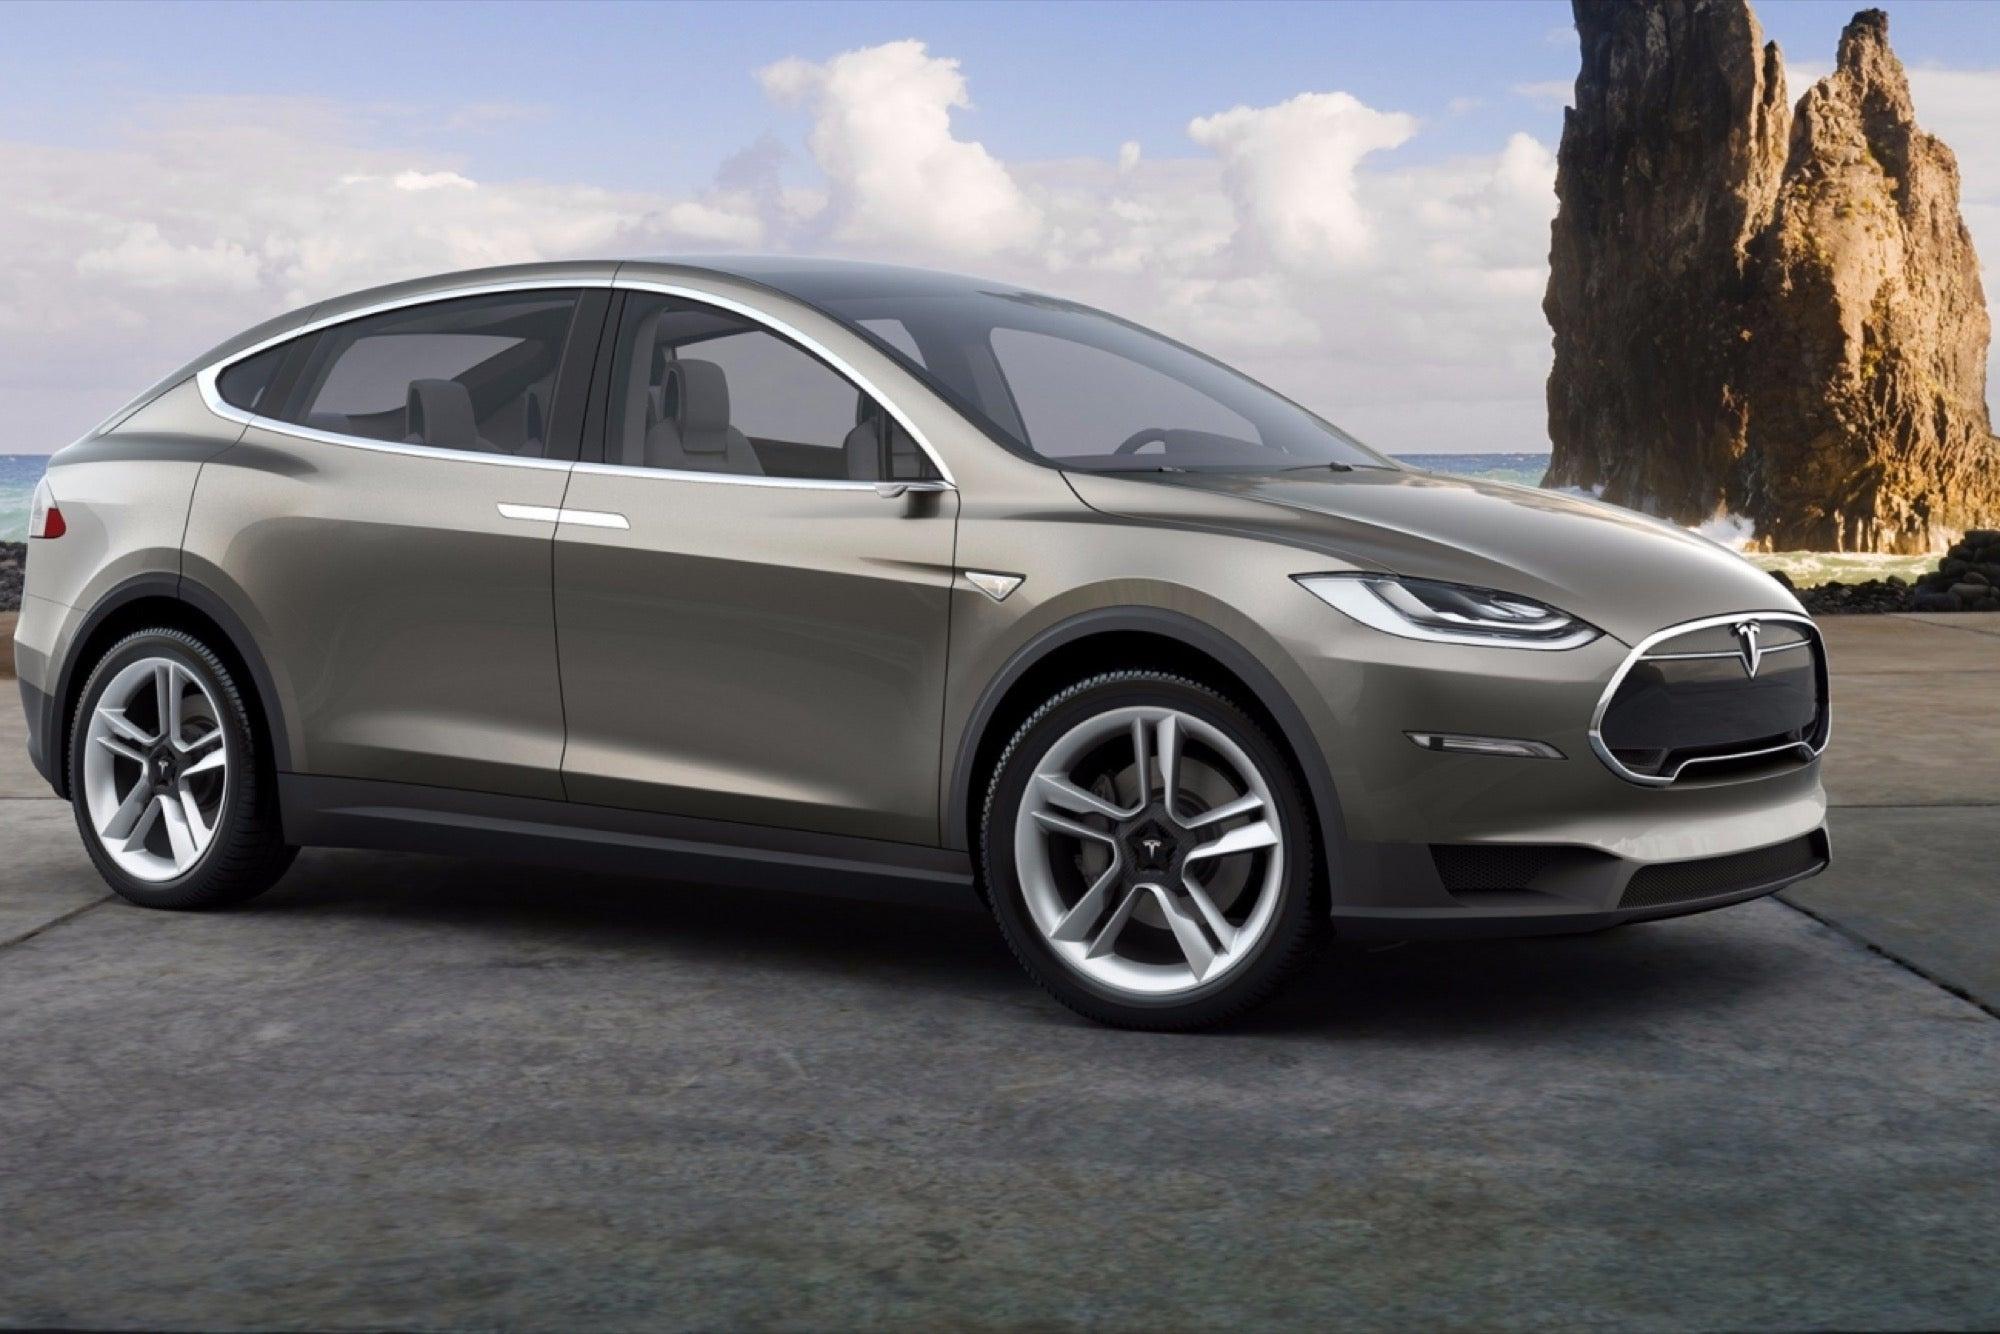 Tesla S New Model X Is A 132 000 Ludicrously Fast Beast